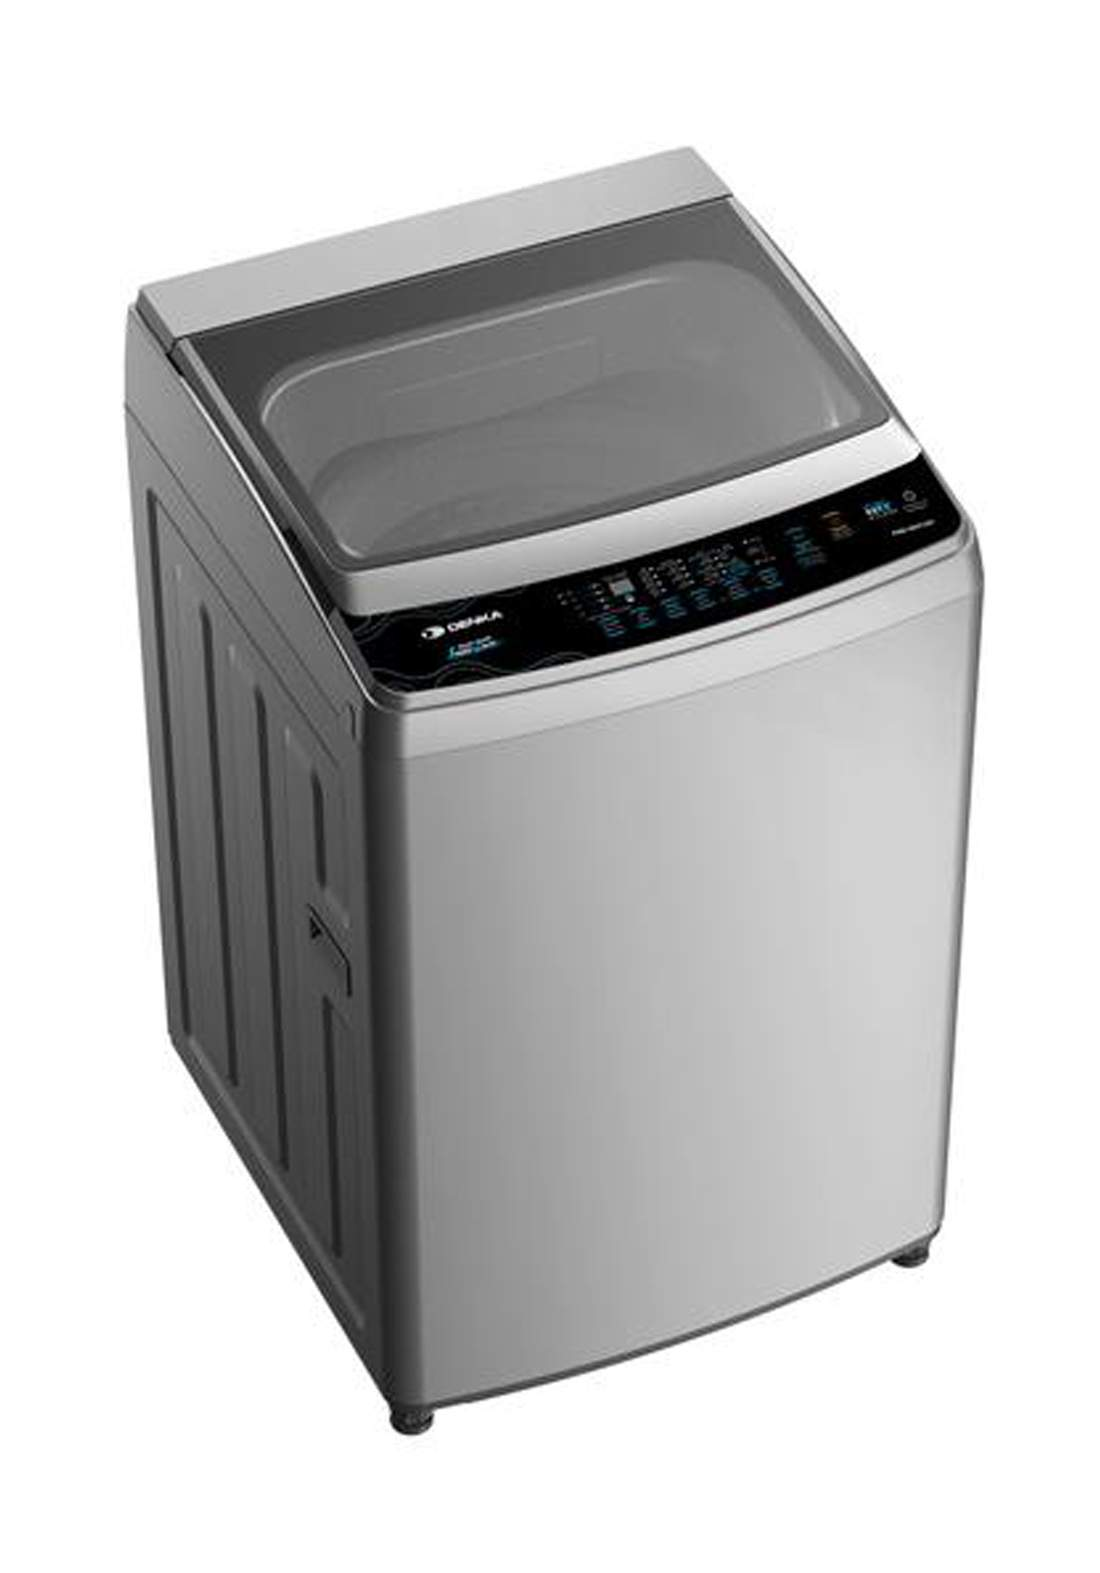 DENKA FWM-1050TLSL  washing machine 10kg  غسالة ملابس